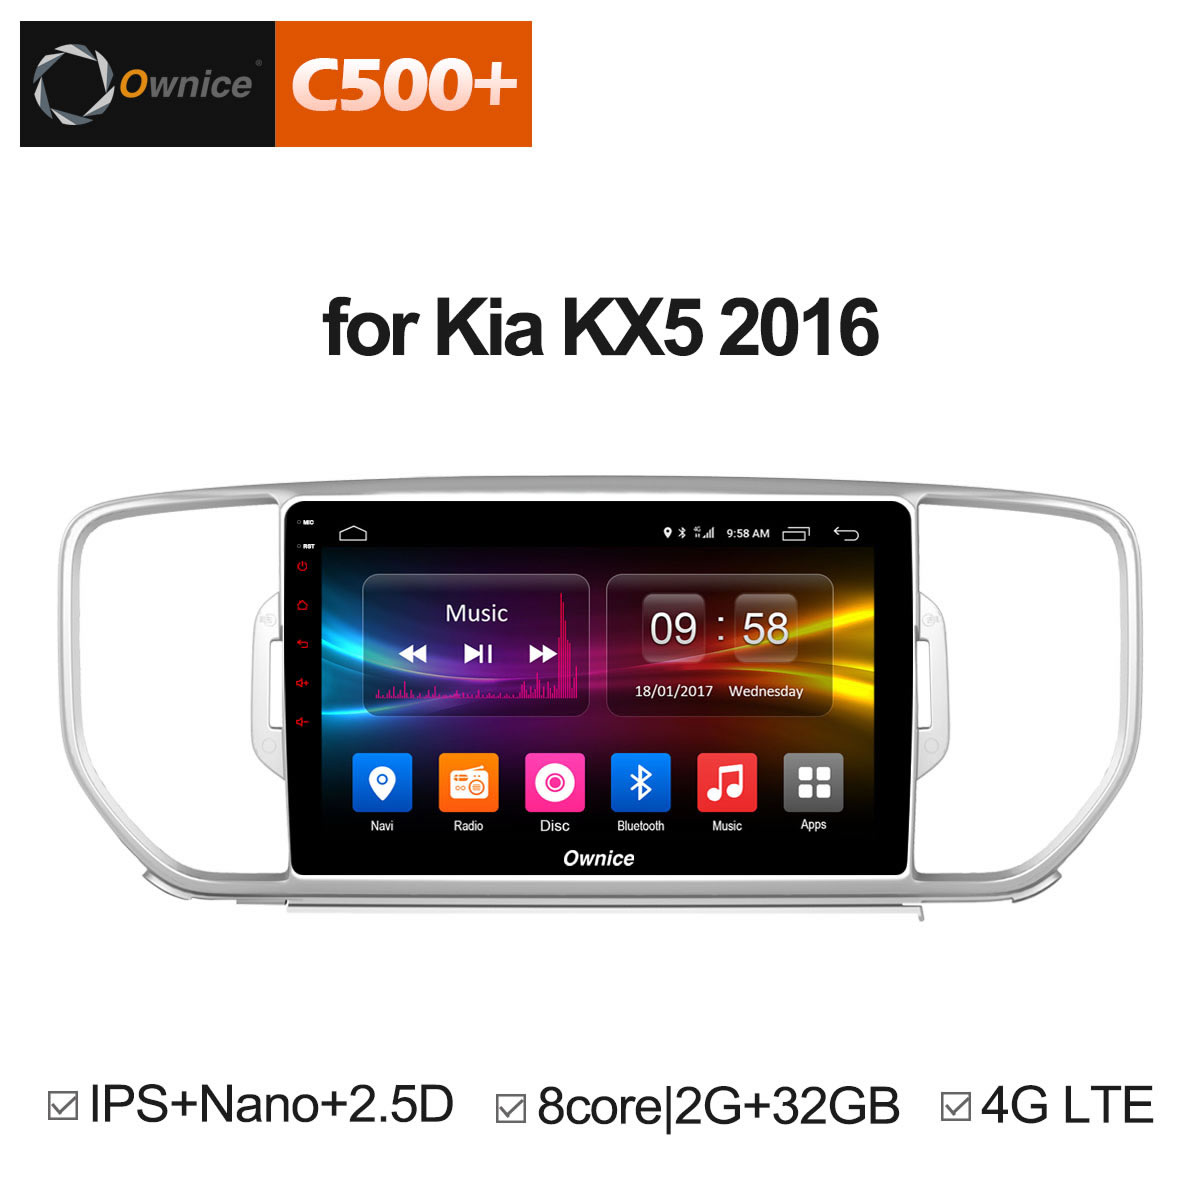 Ownice C500 + KX5 G10 Android 8.1 oito Núcleo Para KIA Sportage 2016 Rádio Do Carro GPS Navi jogador 2 gb RAM gb ROM Suporte 32 4g DVD